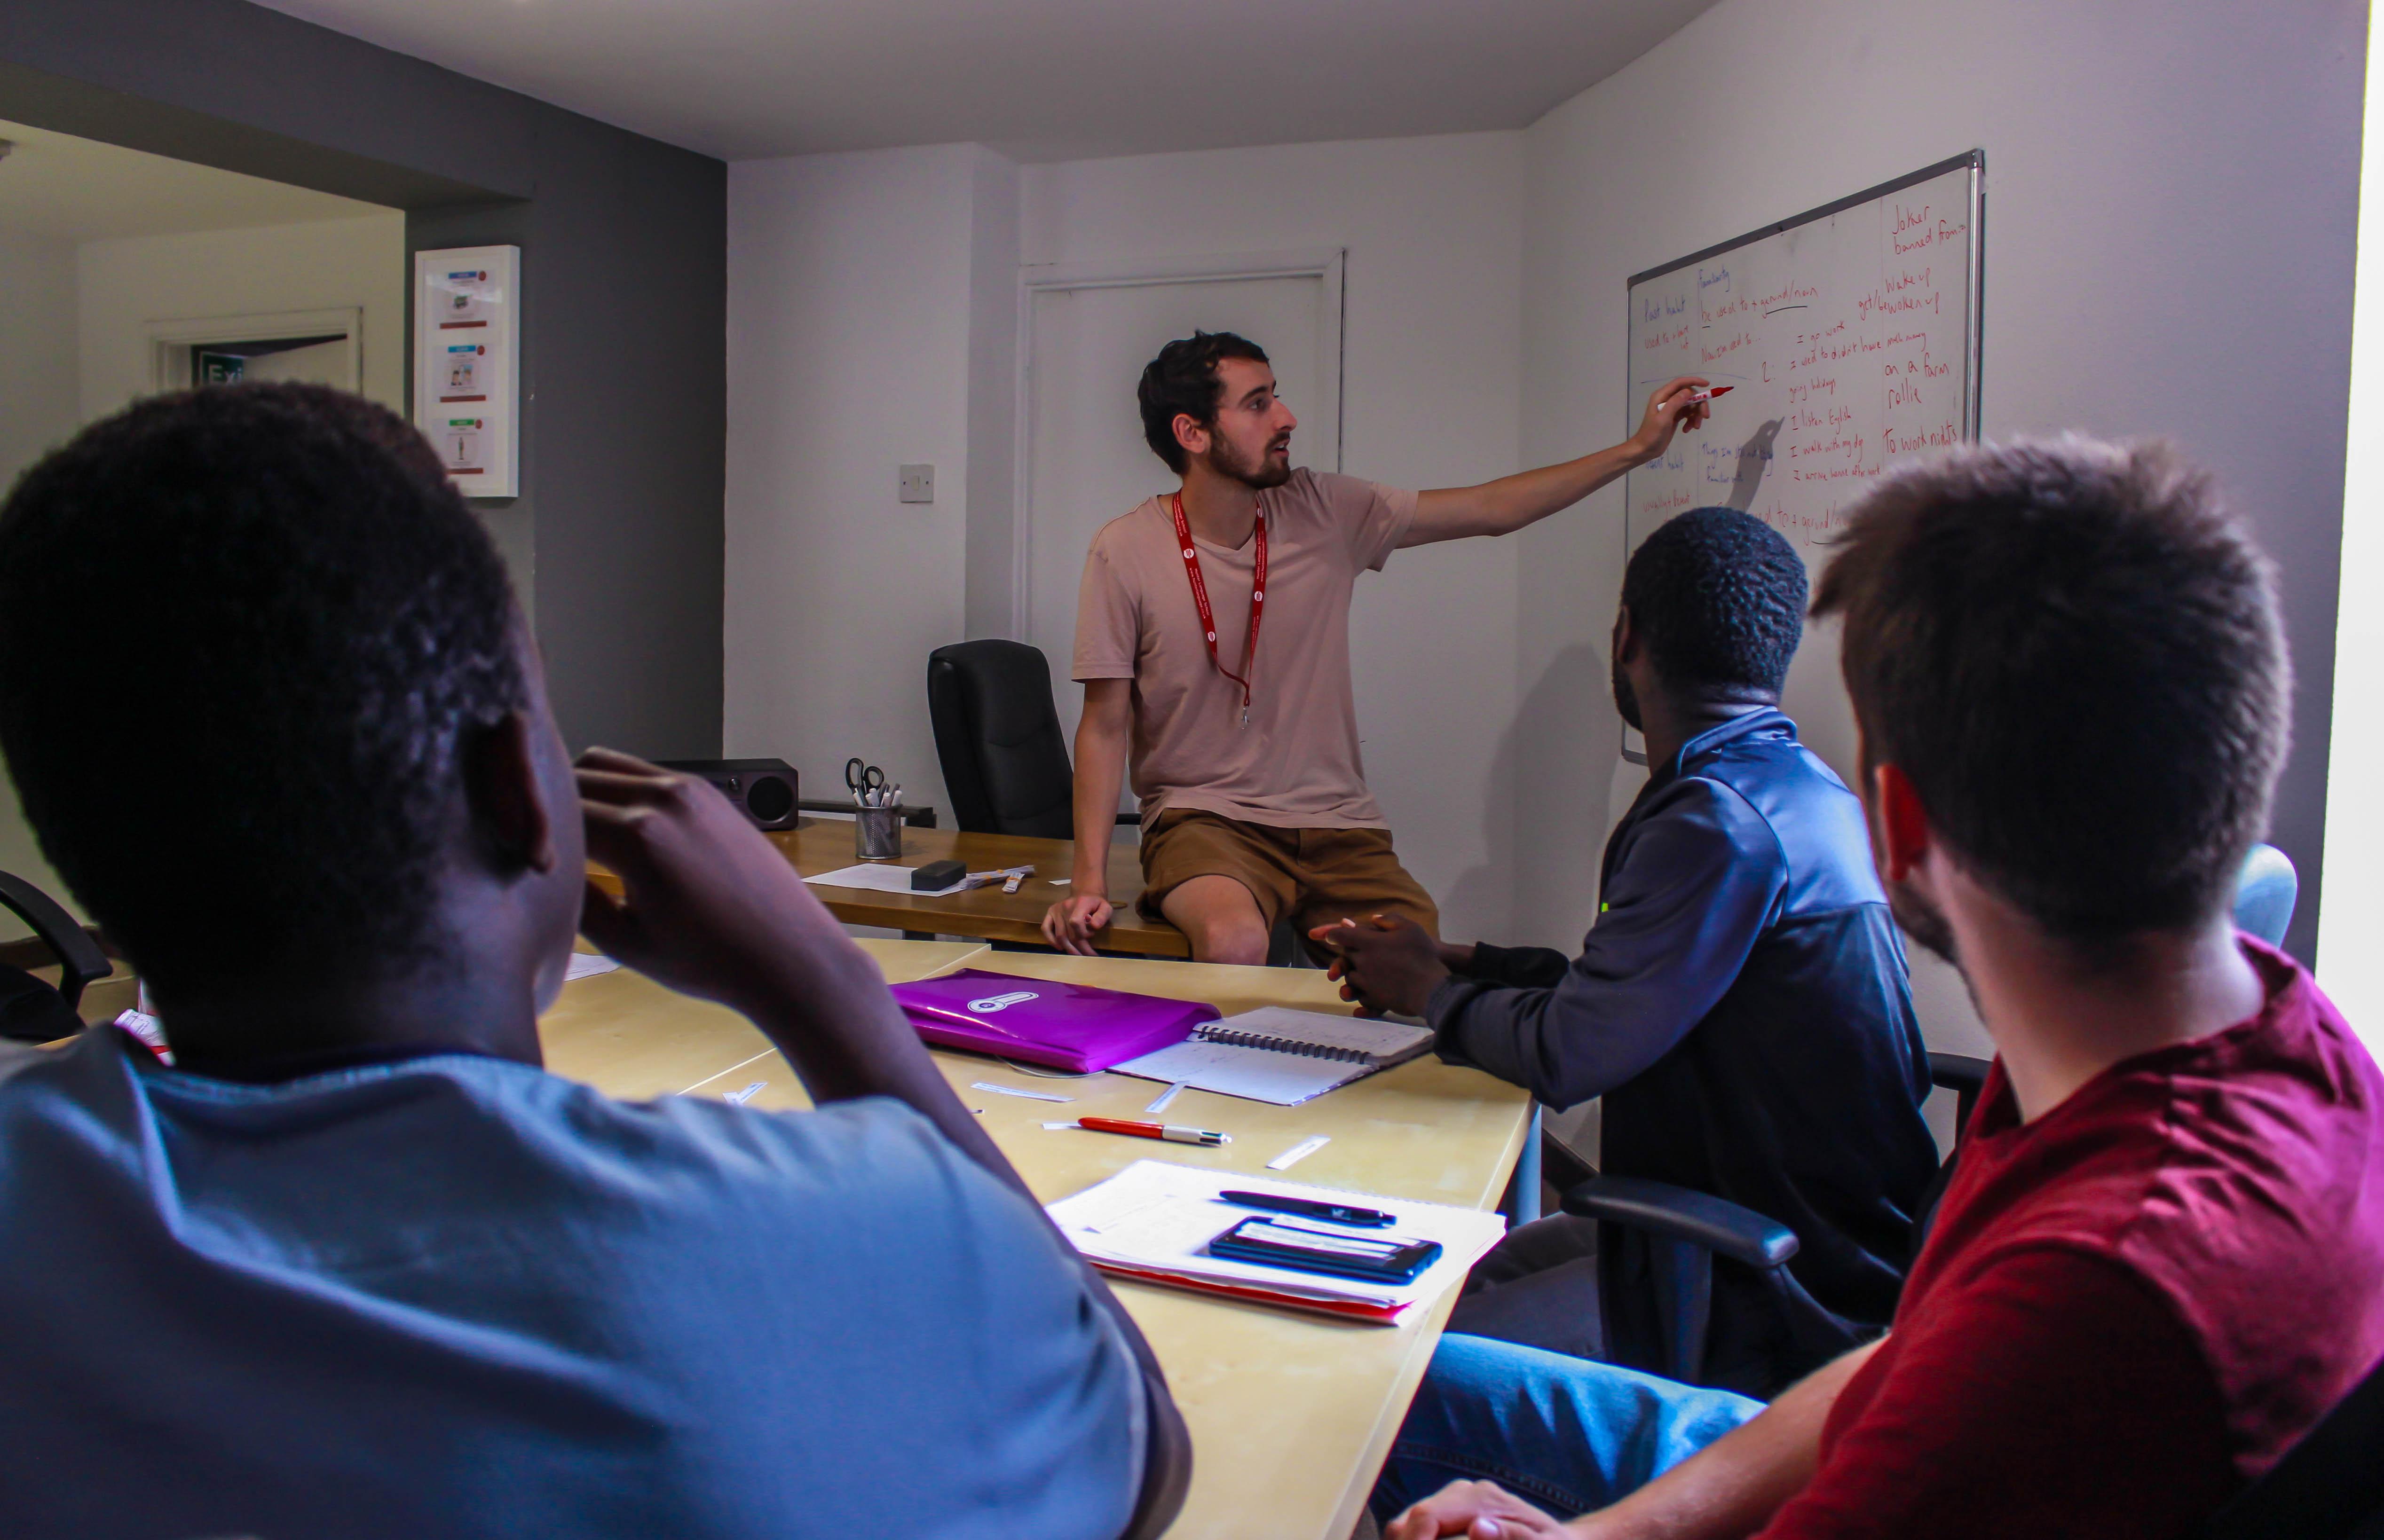 Small groups, dedicated teachers